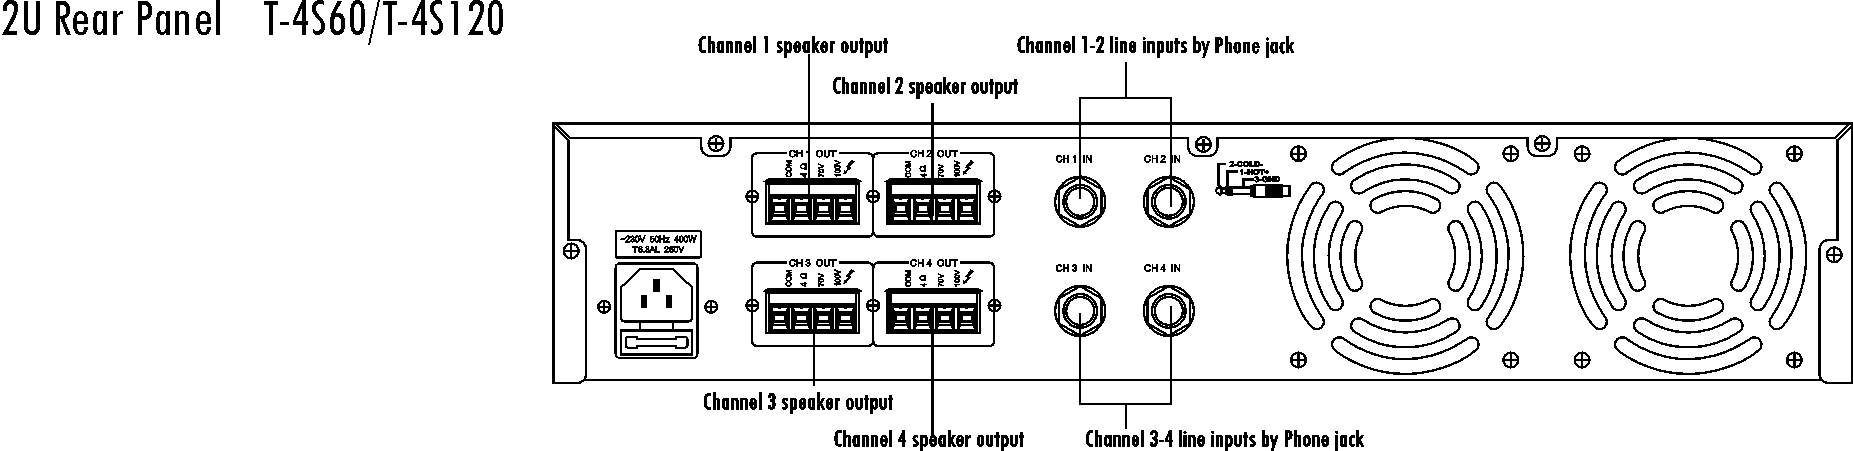 Itc Audio Public Address System Audio Video Conference